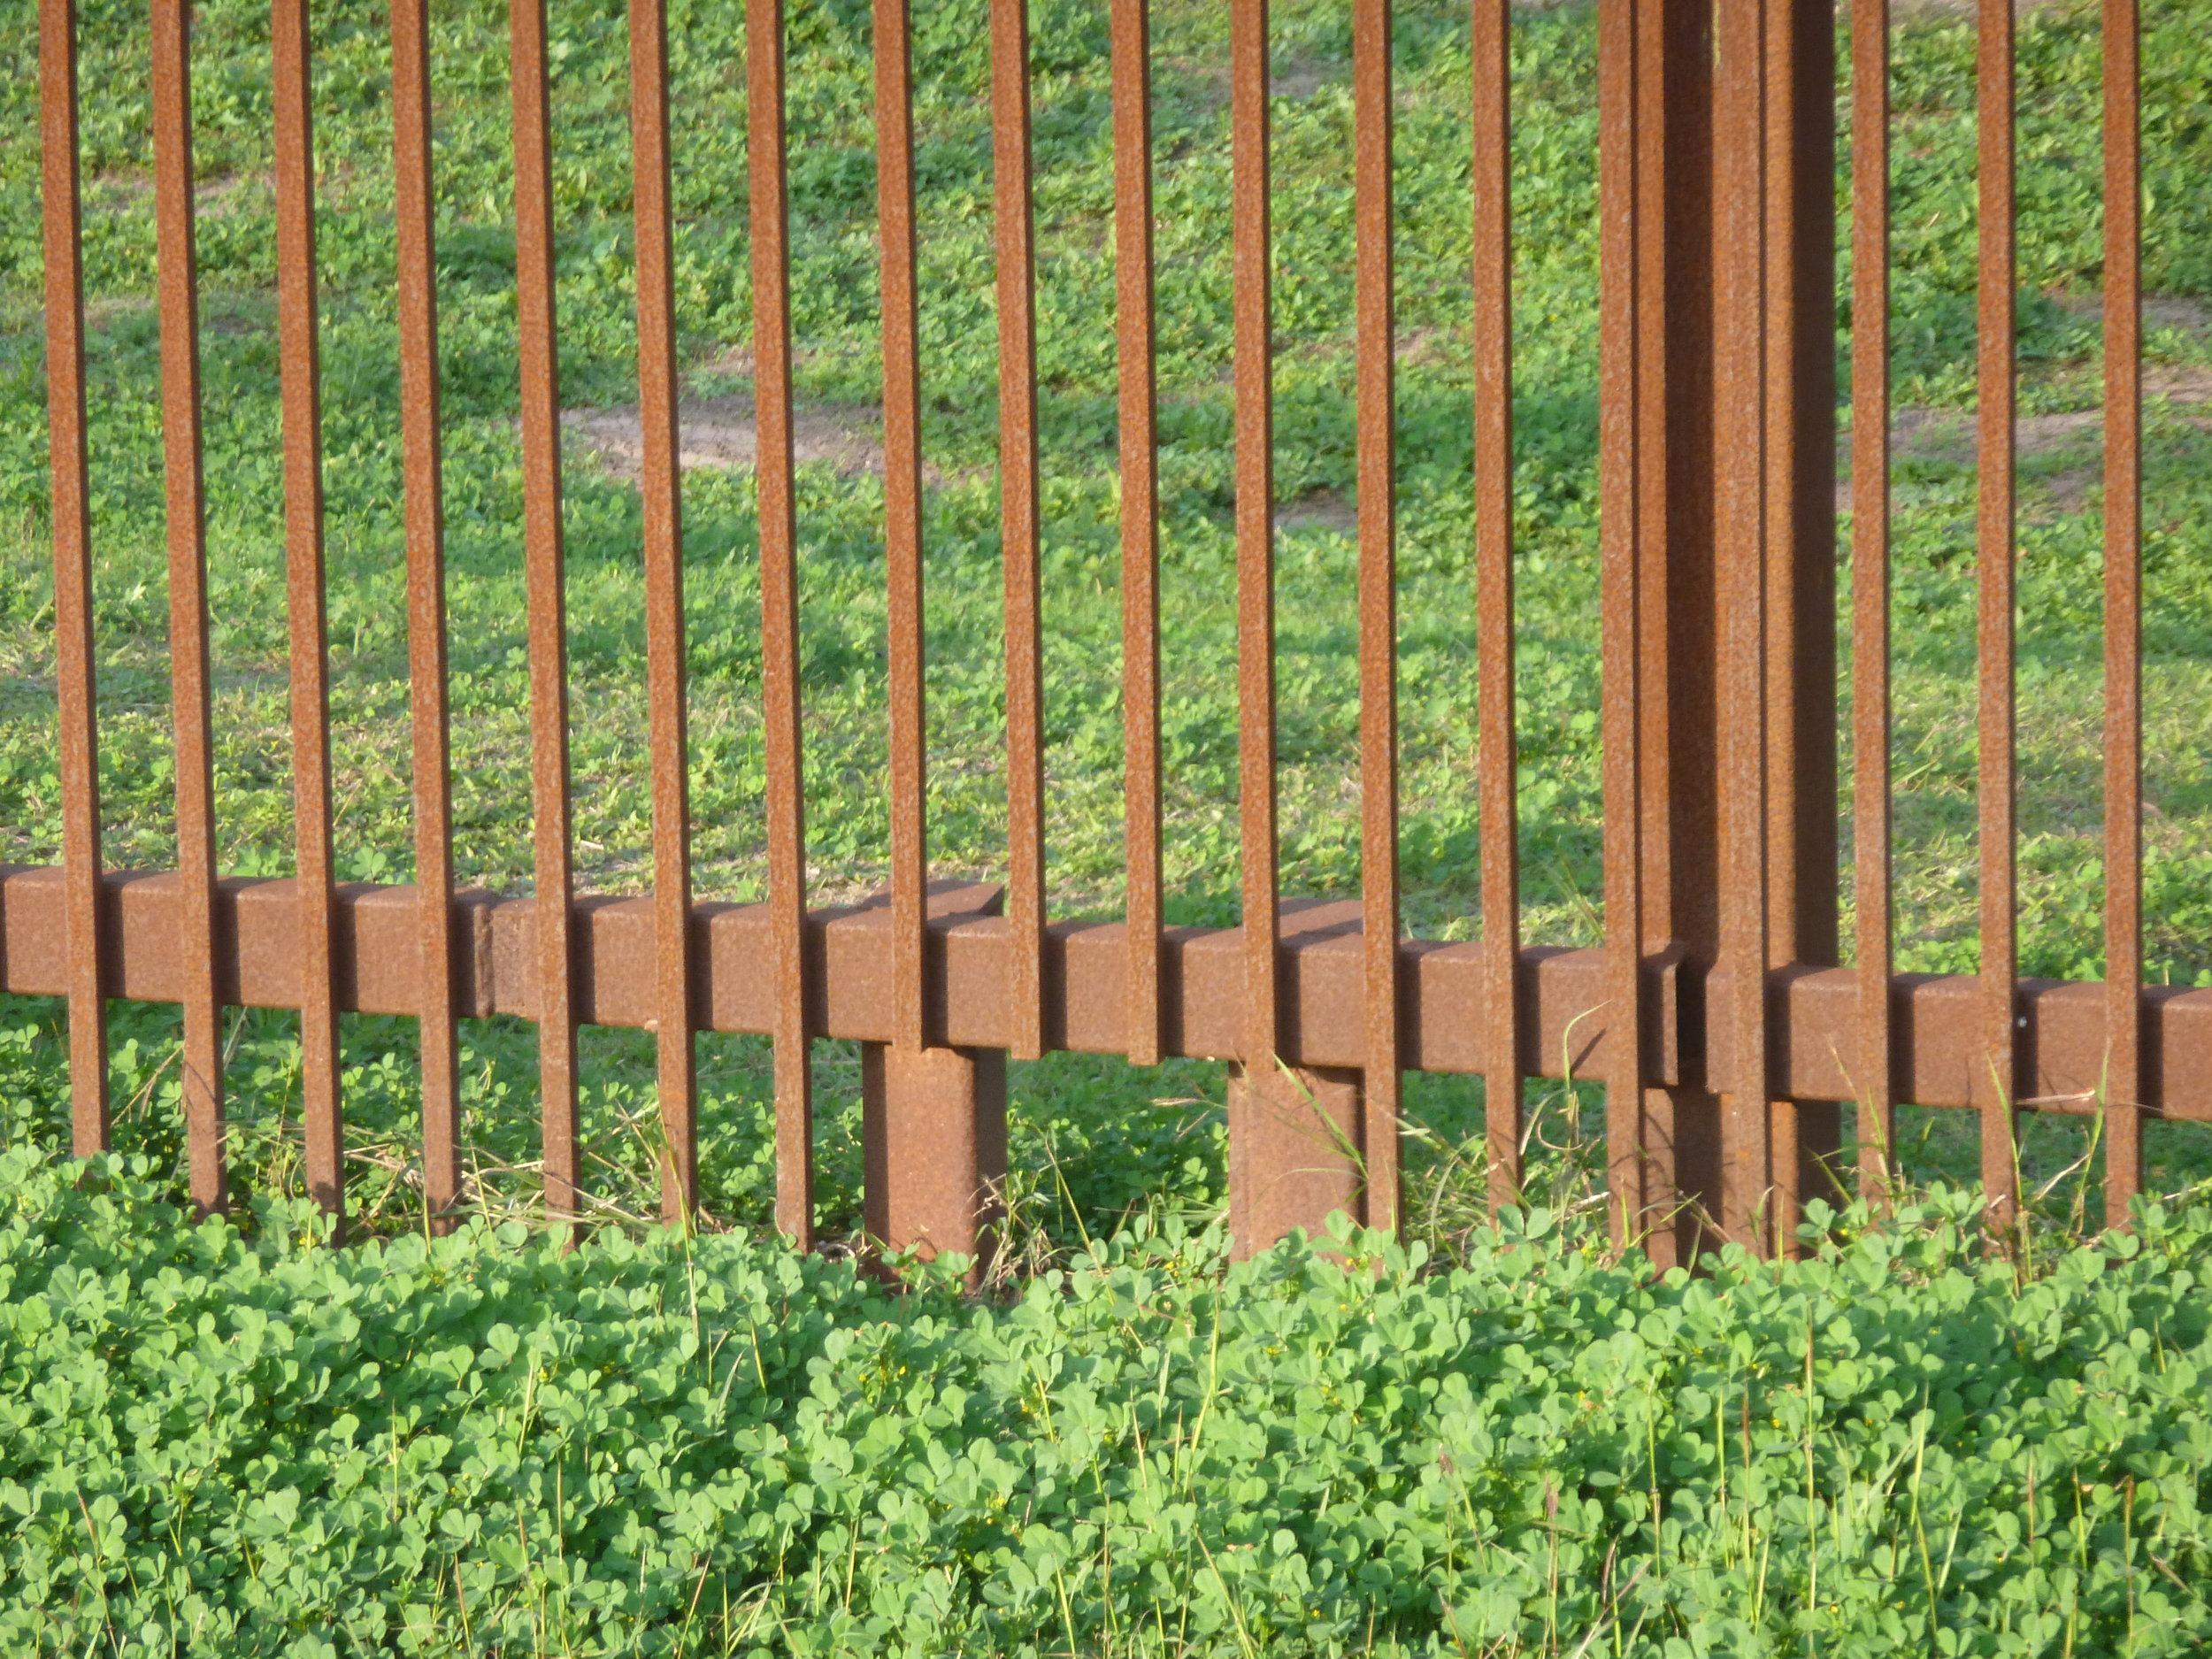 %22Cat hole%22 US Mexico border fence, Brownsville Photo Radhika Subramaniam.jpg